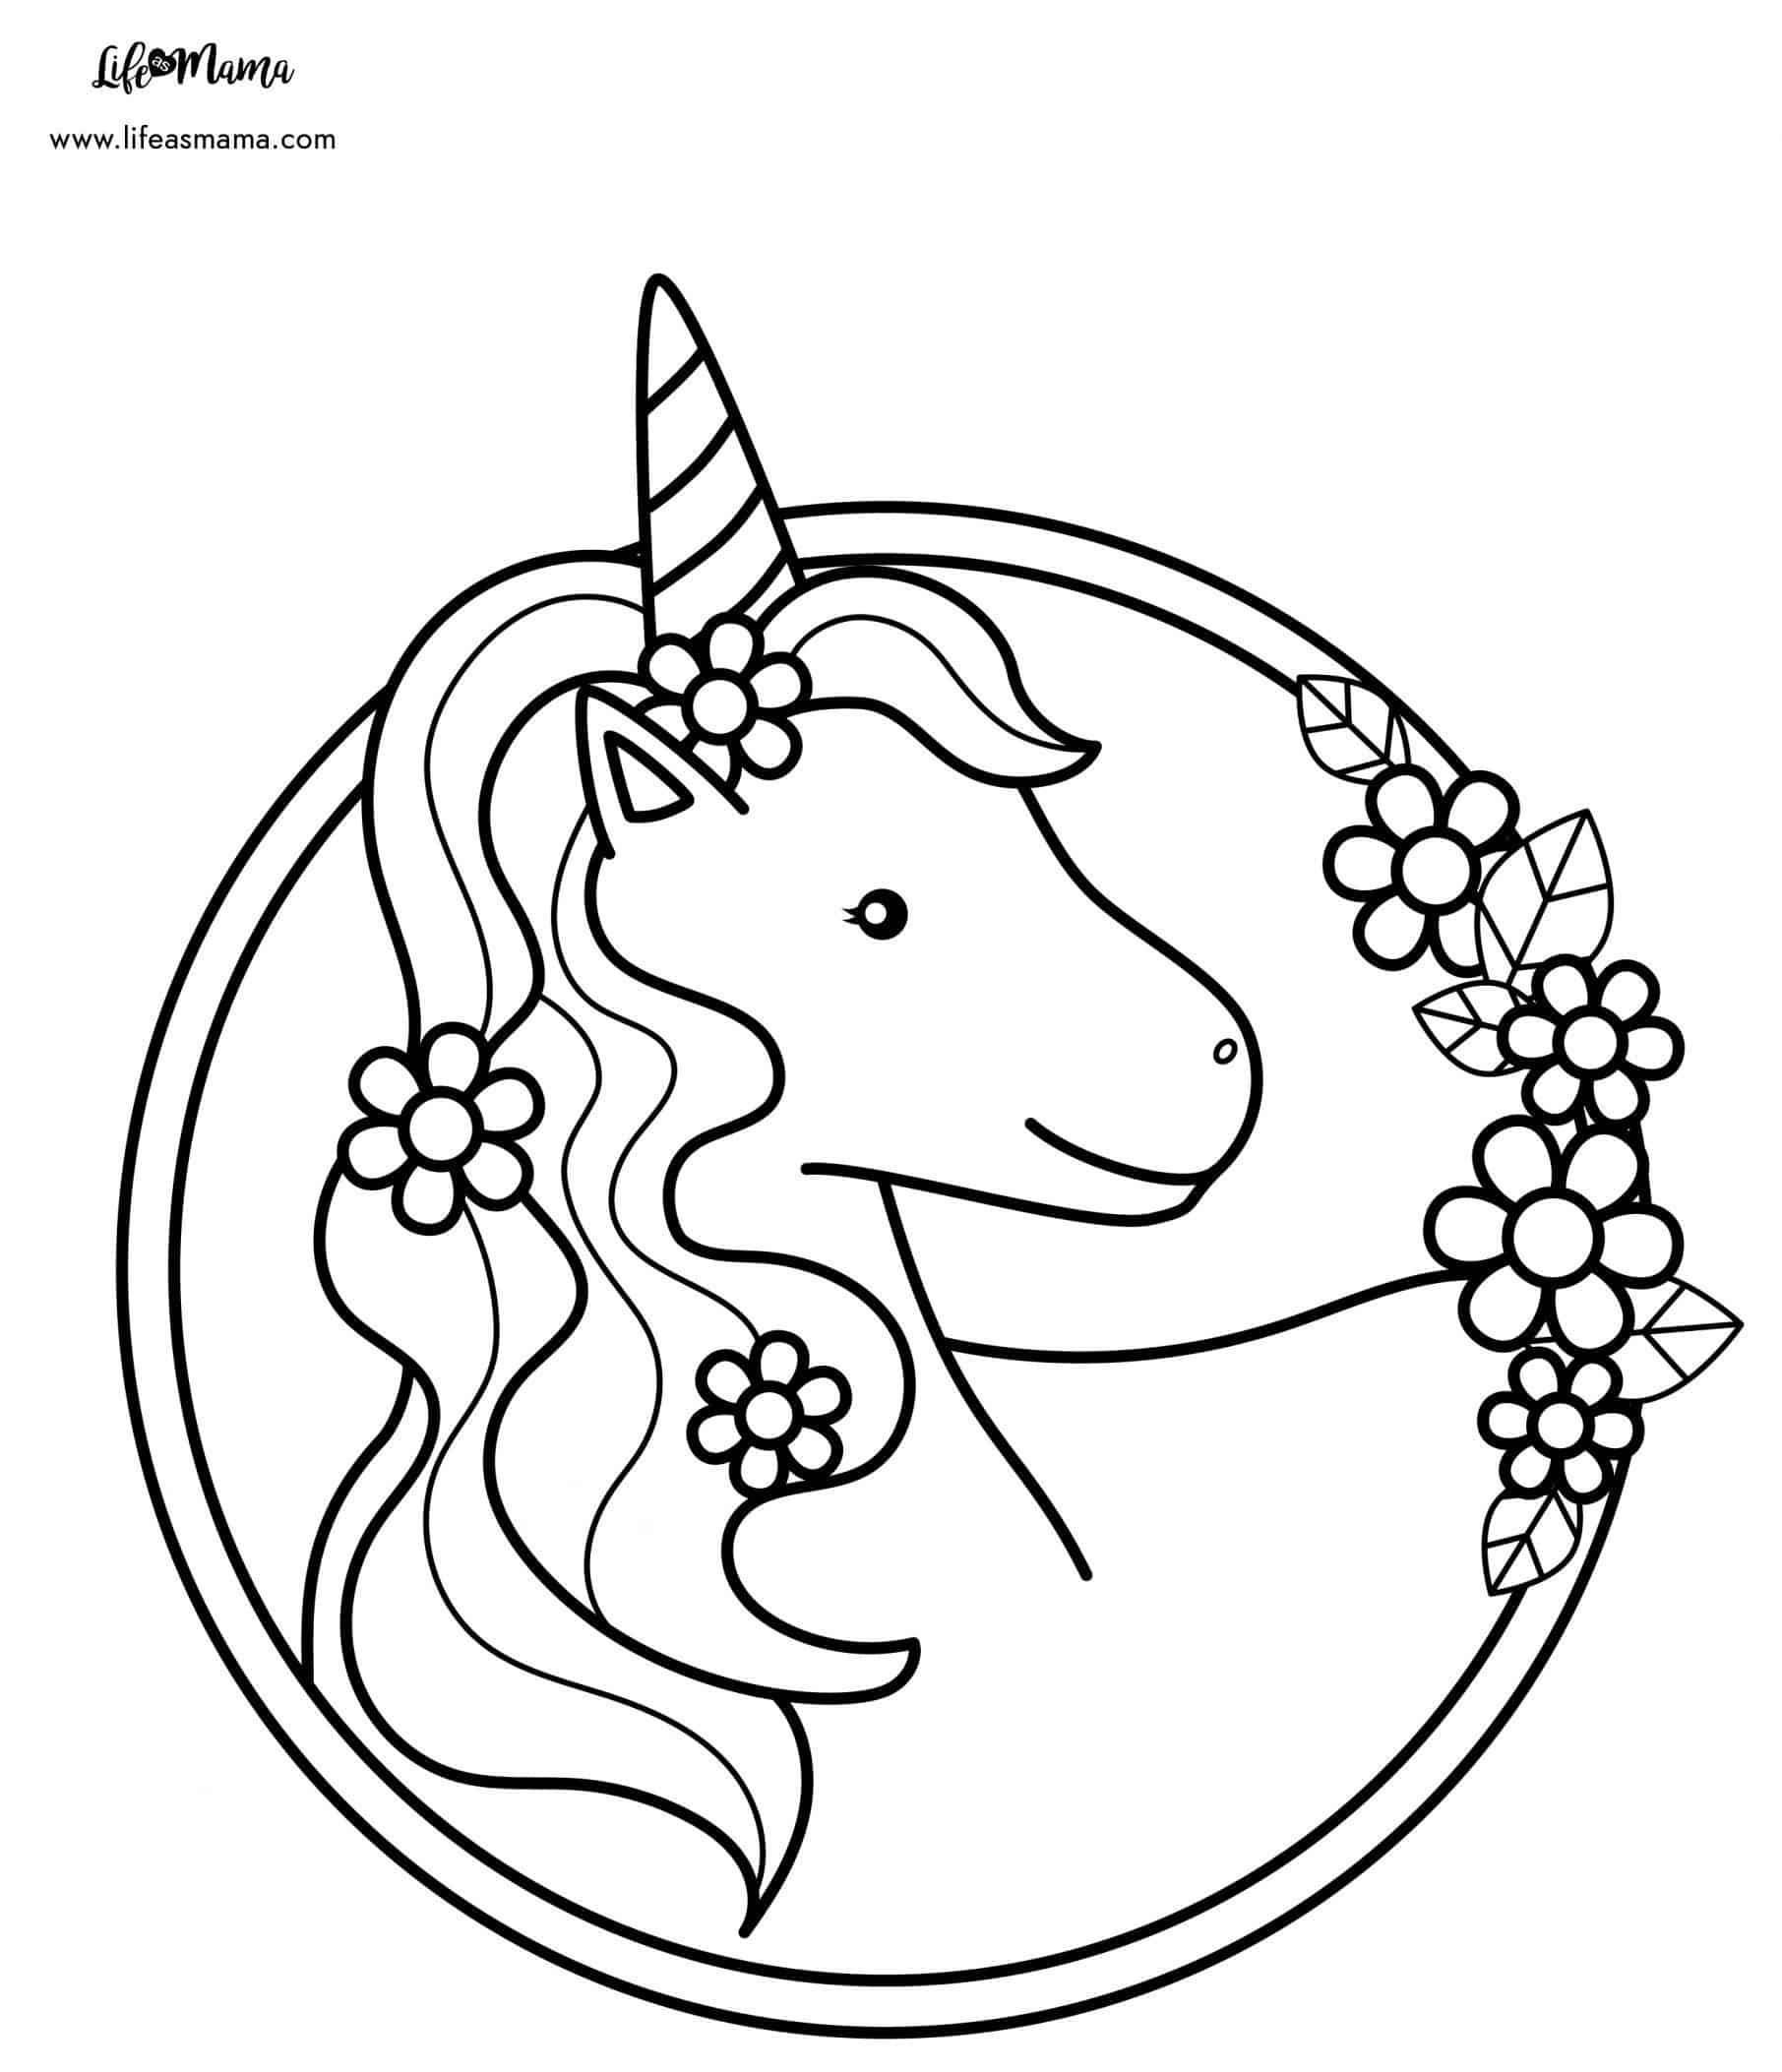 Unicorns Coloring Page-01